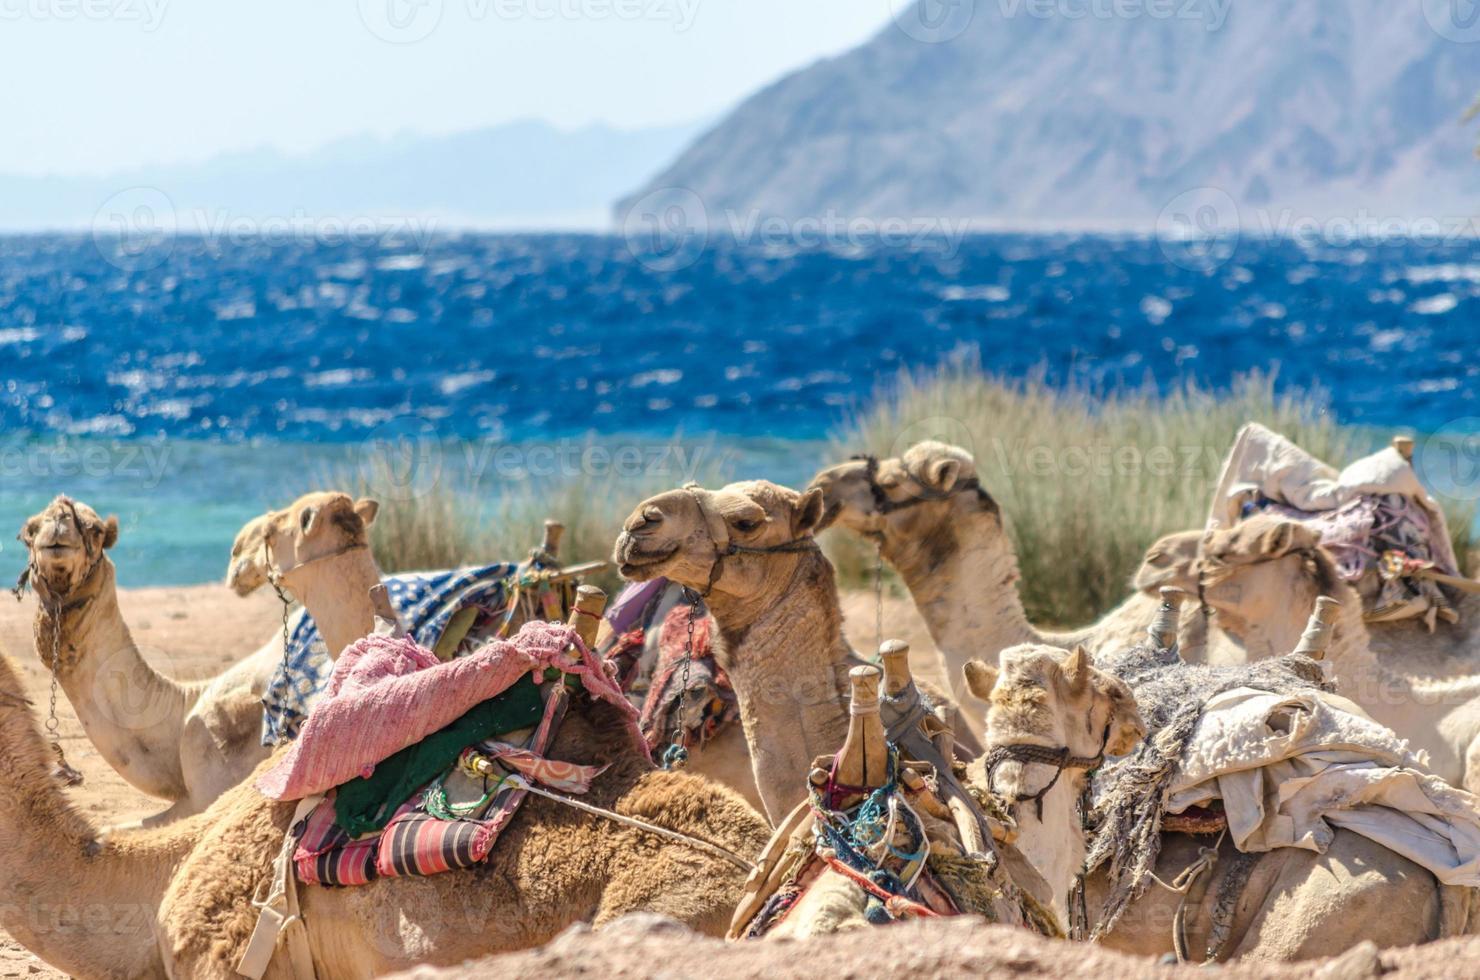 Kamele liegen im Sand foto